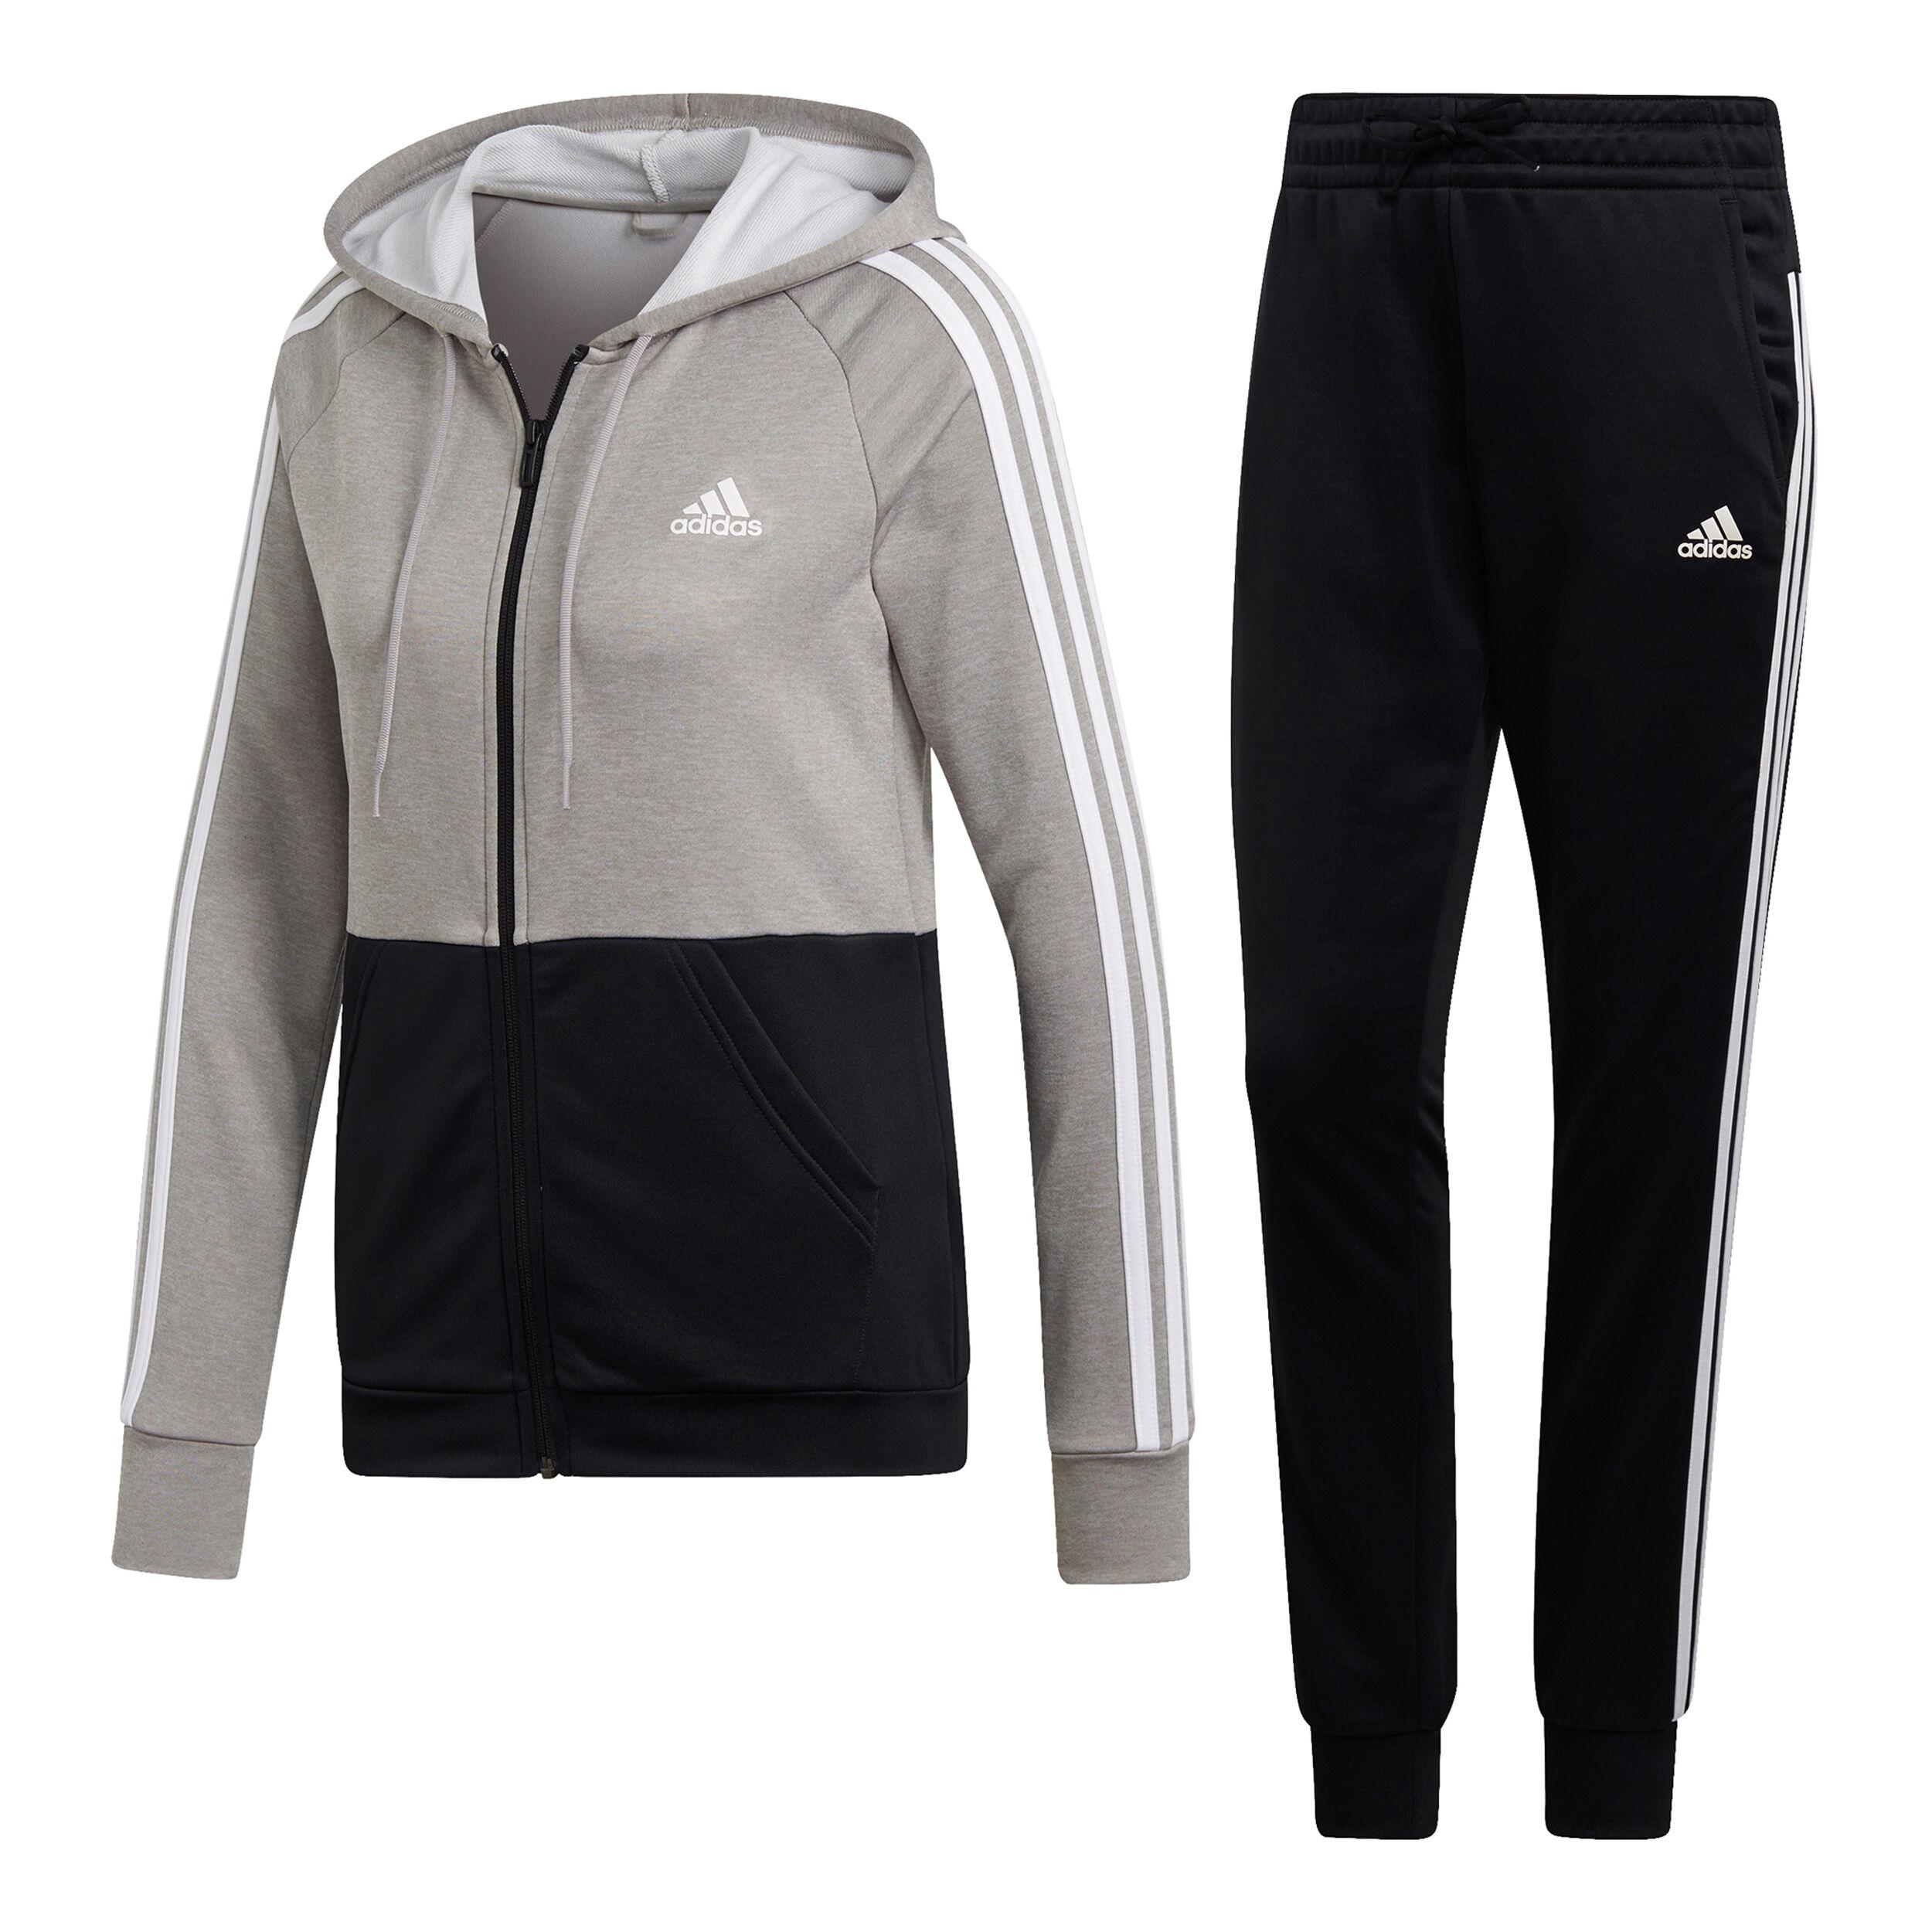 adidas Game Time Trainingsanzug Damen Grau, Schwarz online